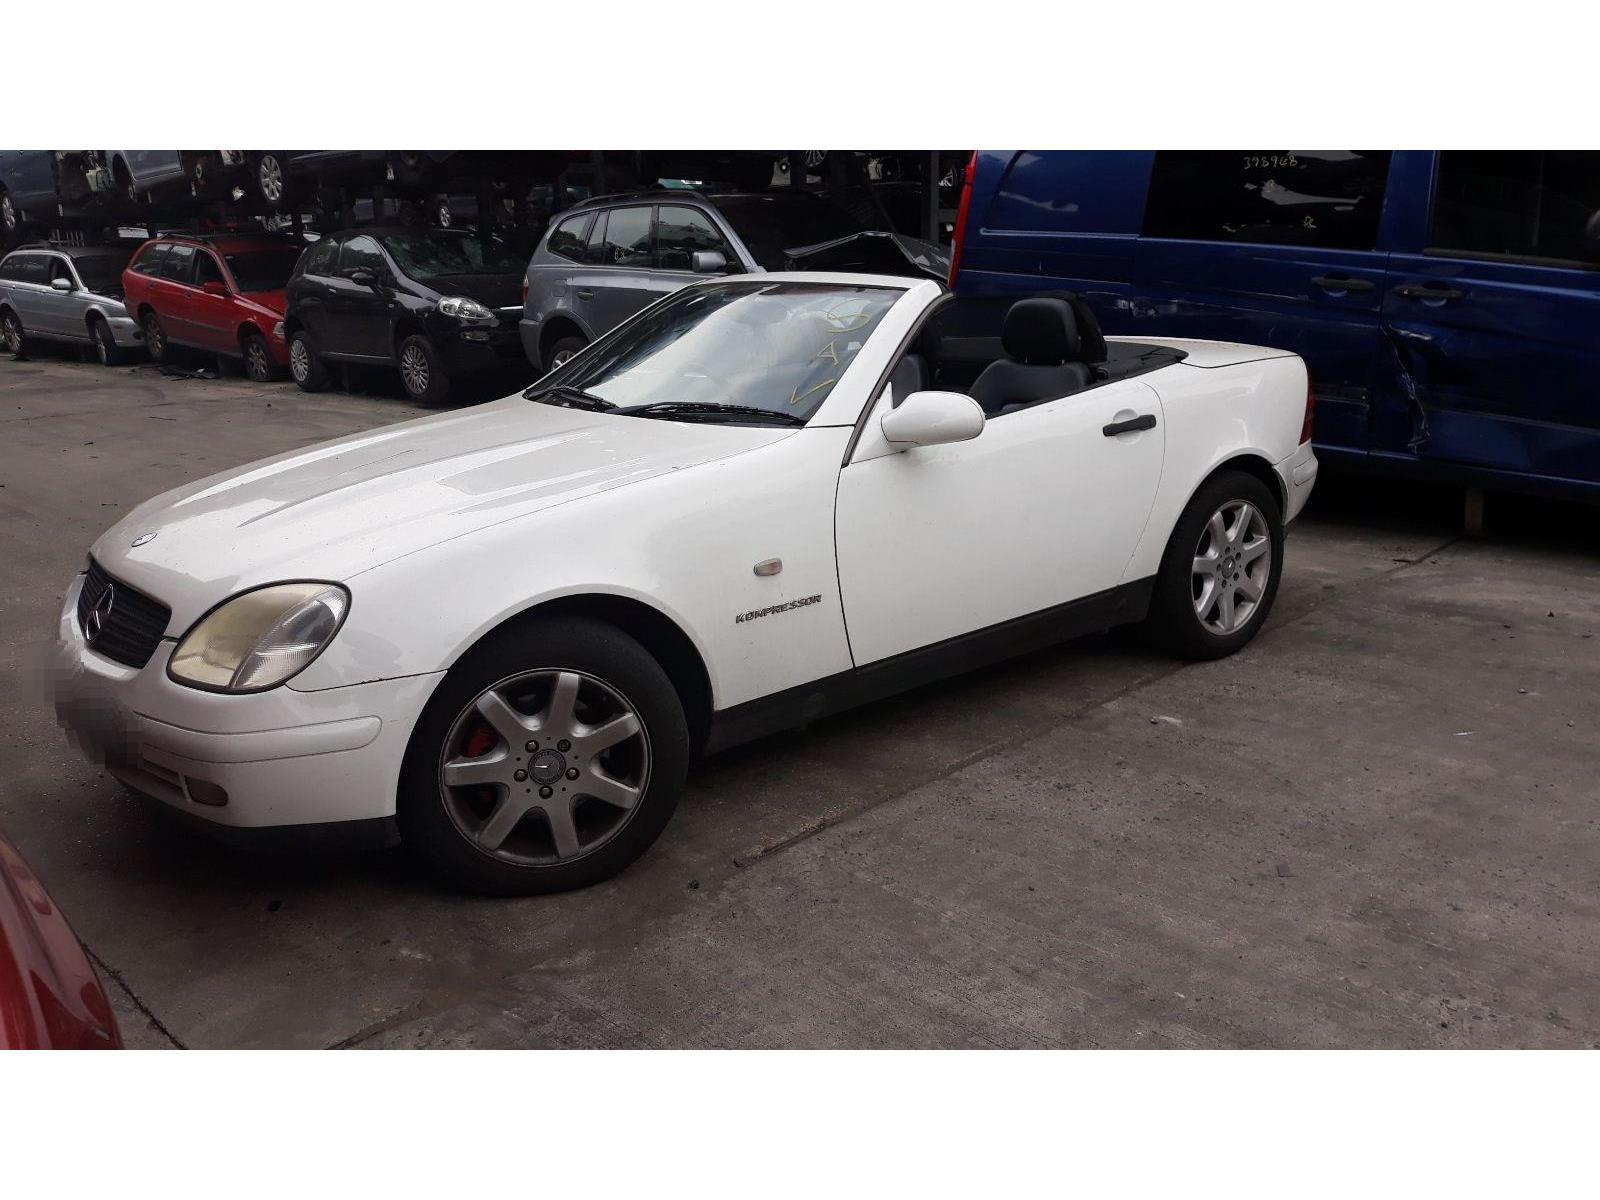 Mercedes Benz SLK 1996 To 2004 230k 2 Door Cabriolet